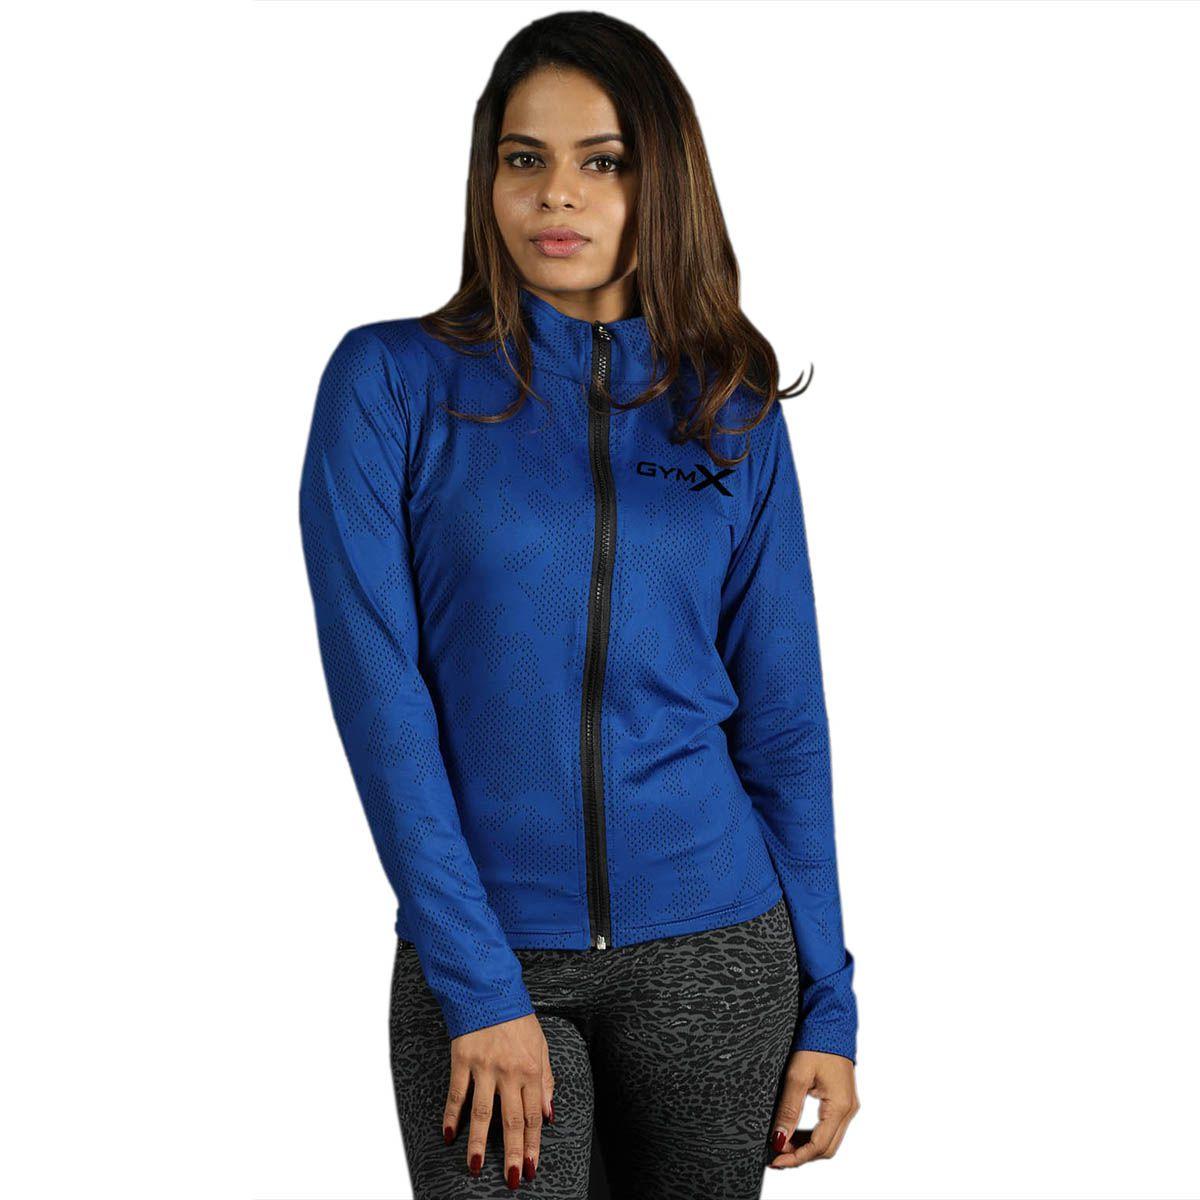 GymX Womens Royal Blue Full Zip Jacket- Athena Series(Size:Large)